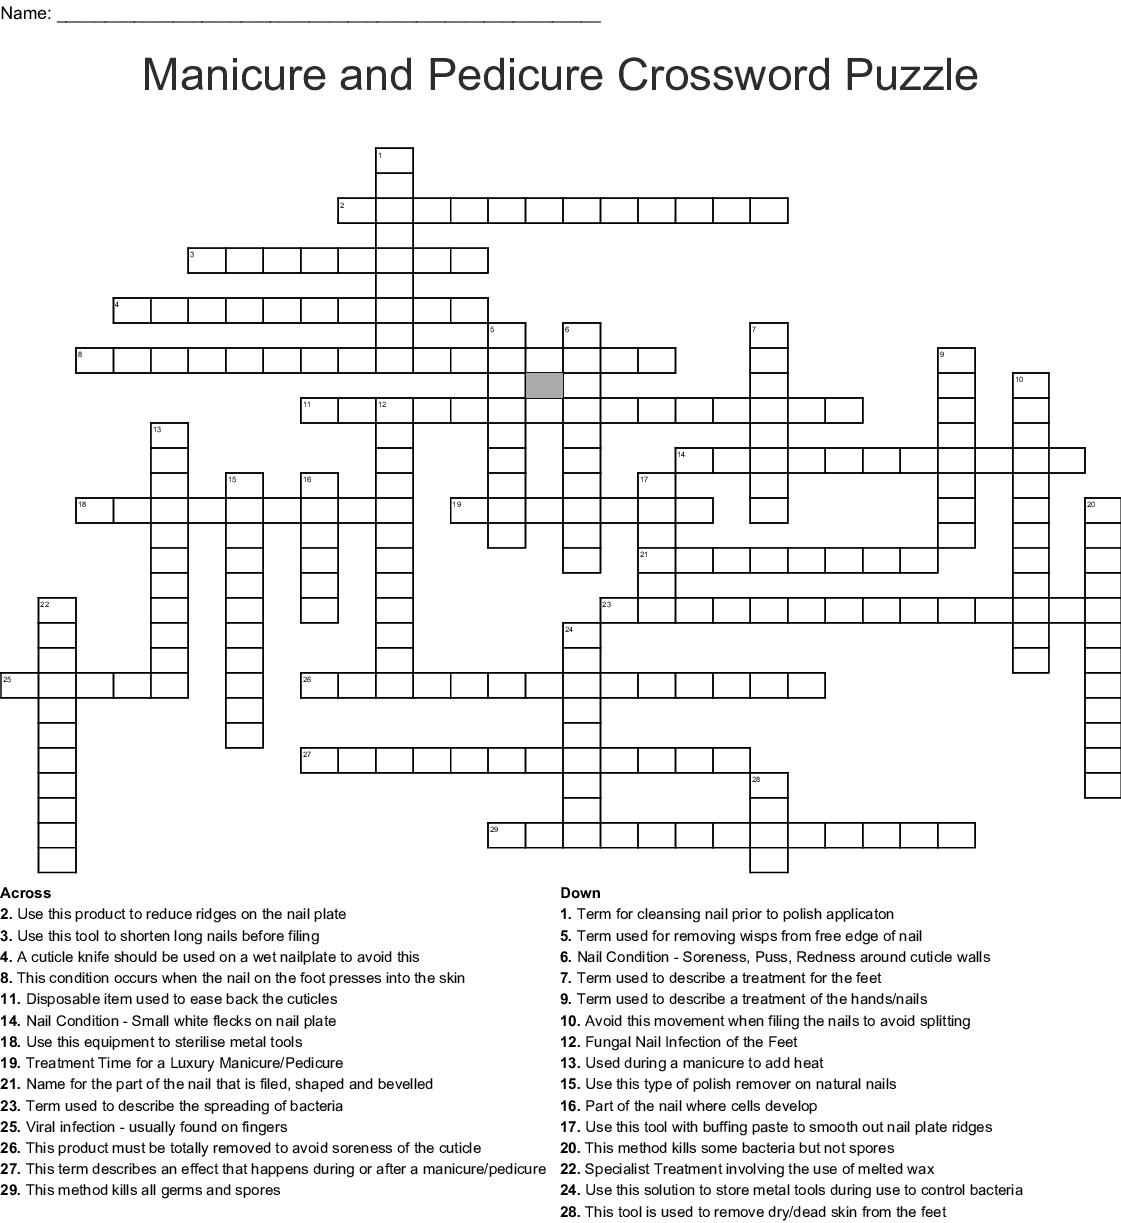 wart on the foot crossword clue